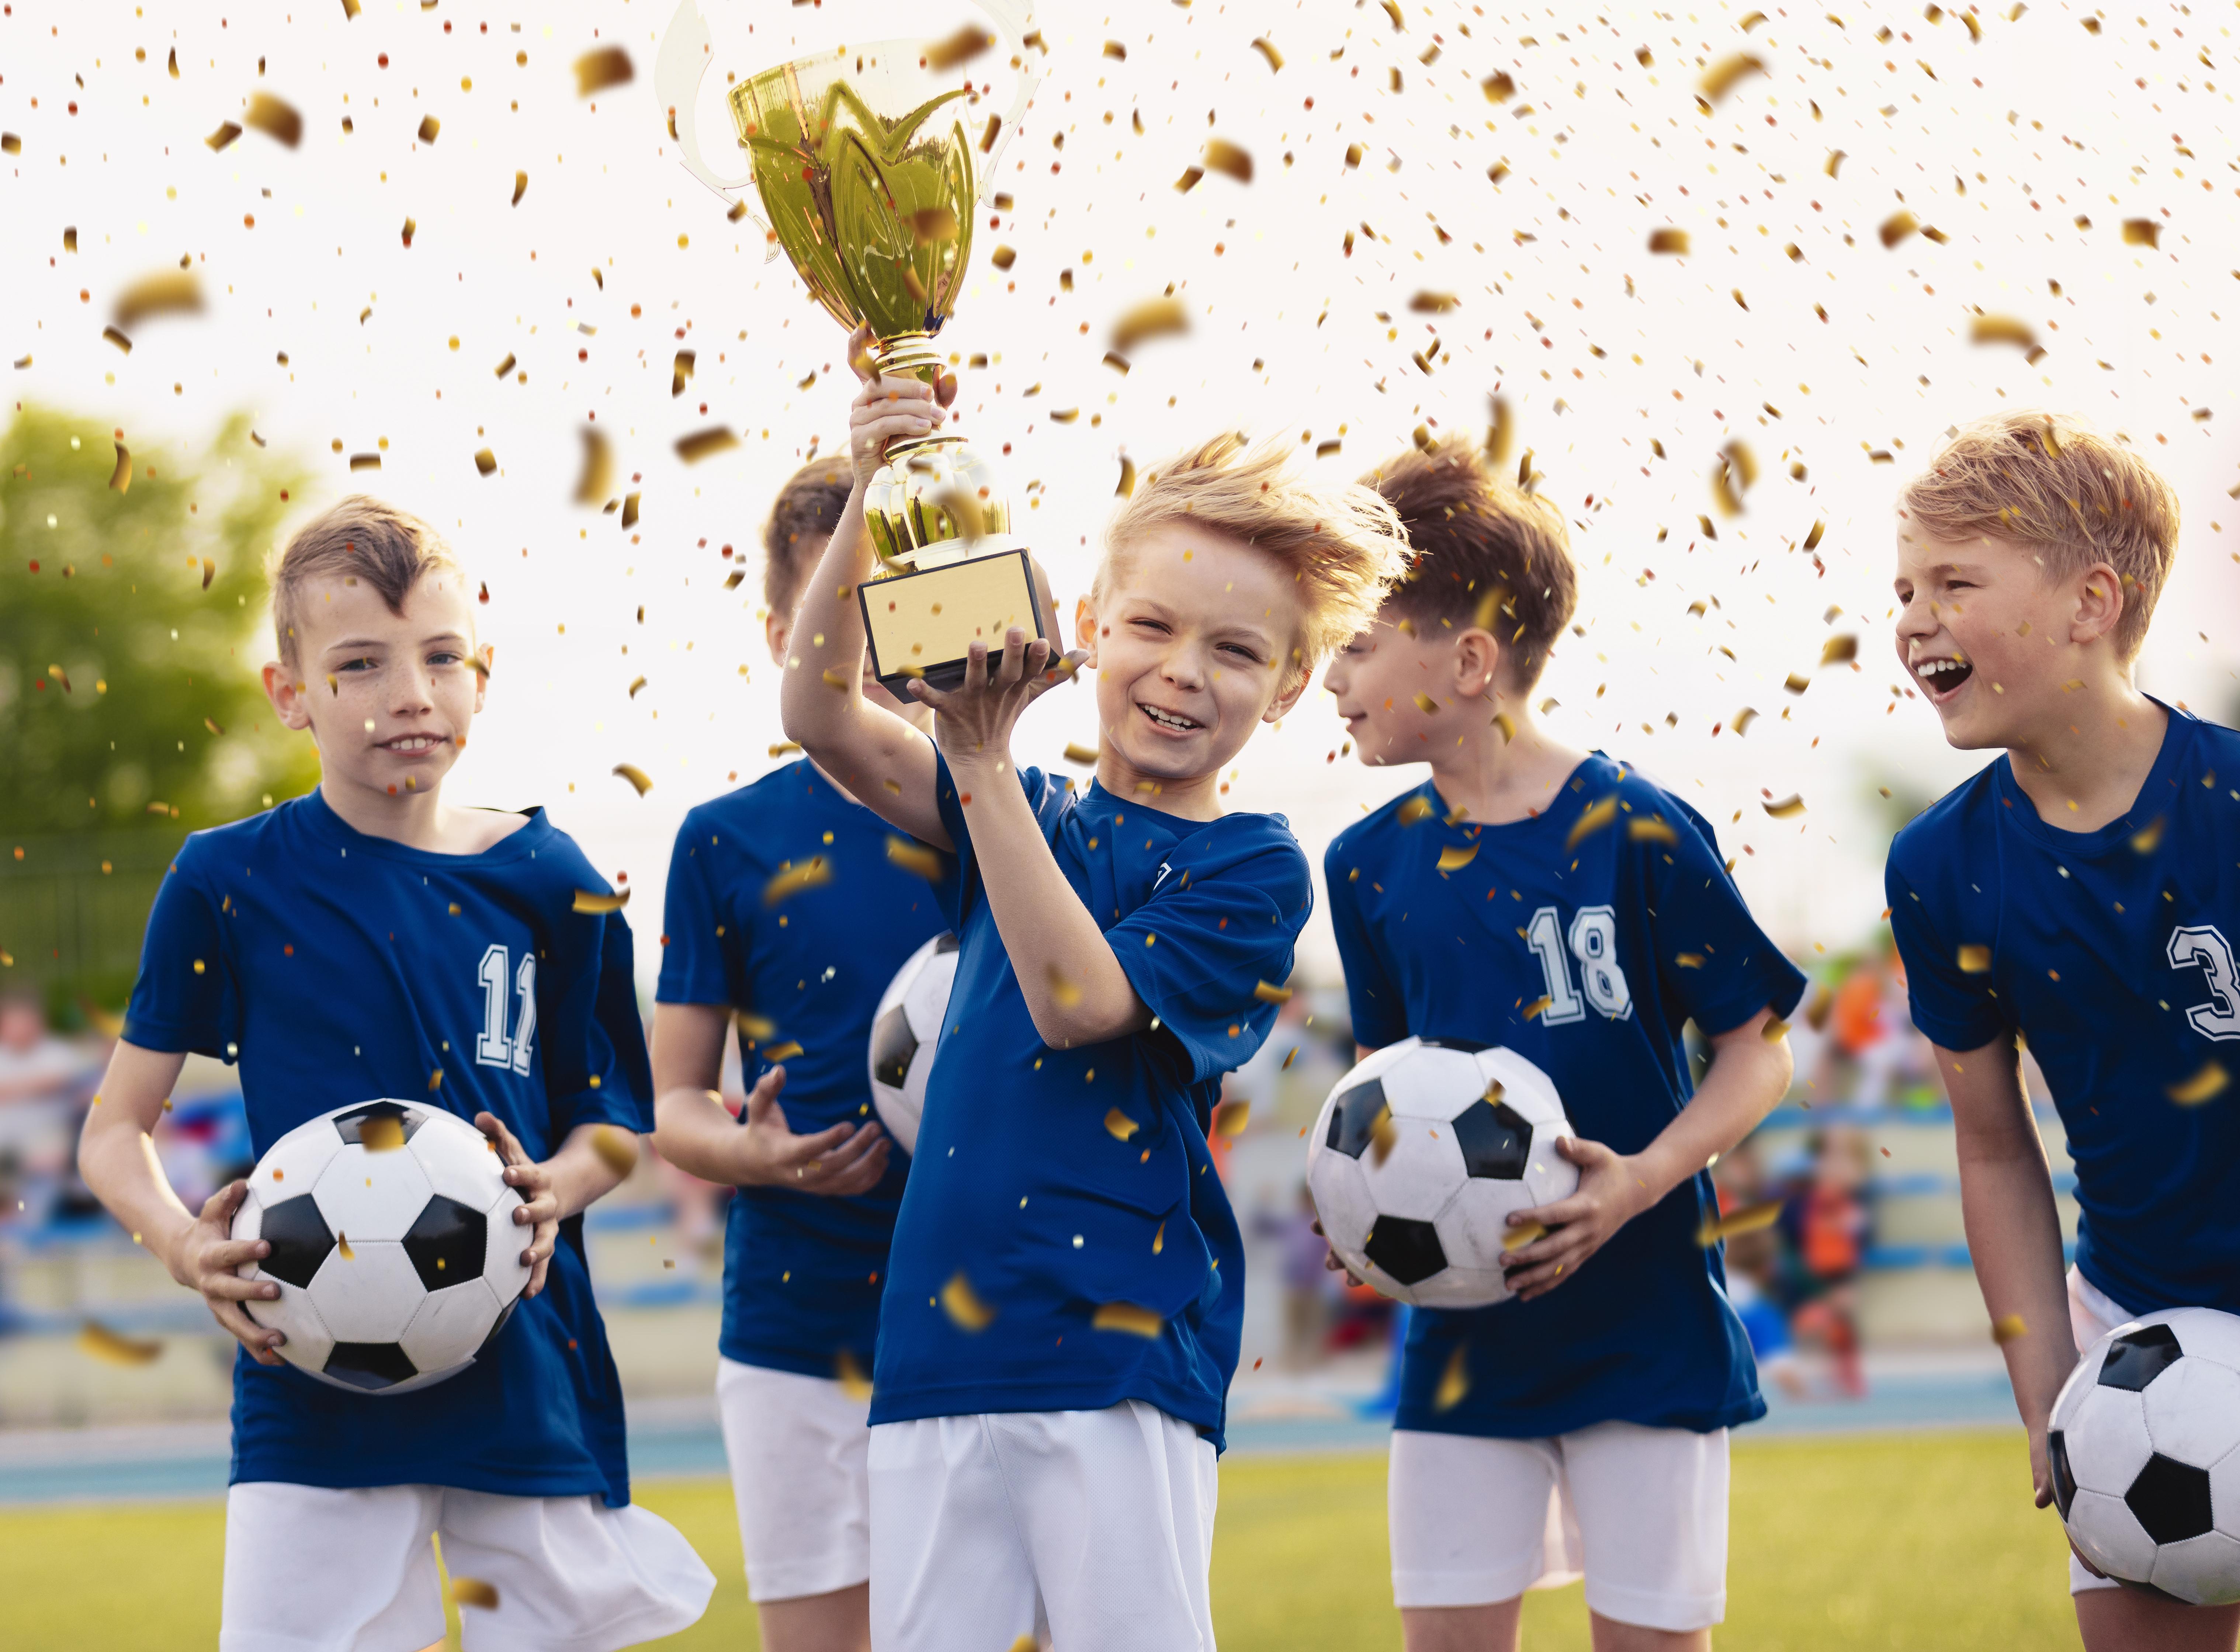 Winning in Youth Sports